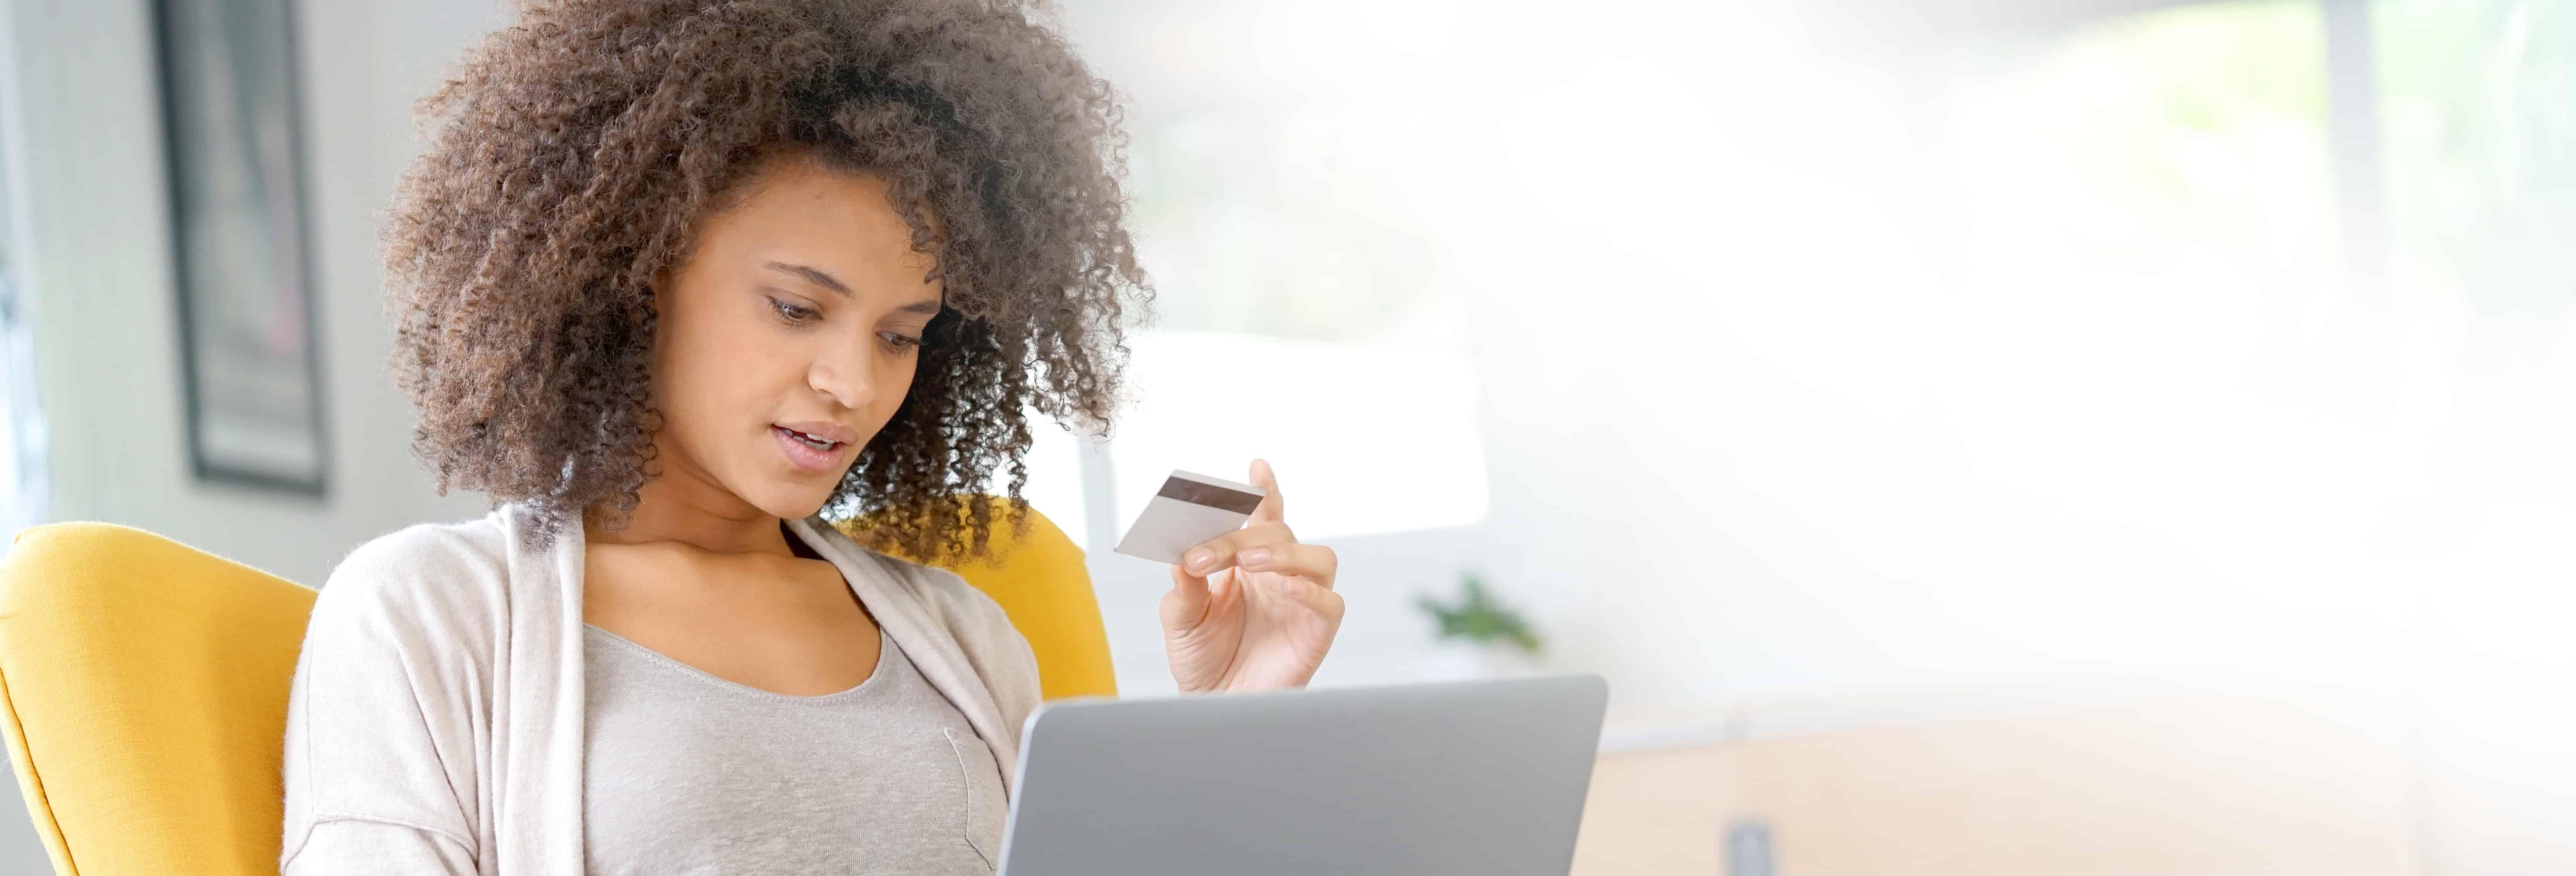 Beautiful mixed race woman shopping on internet